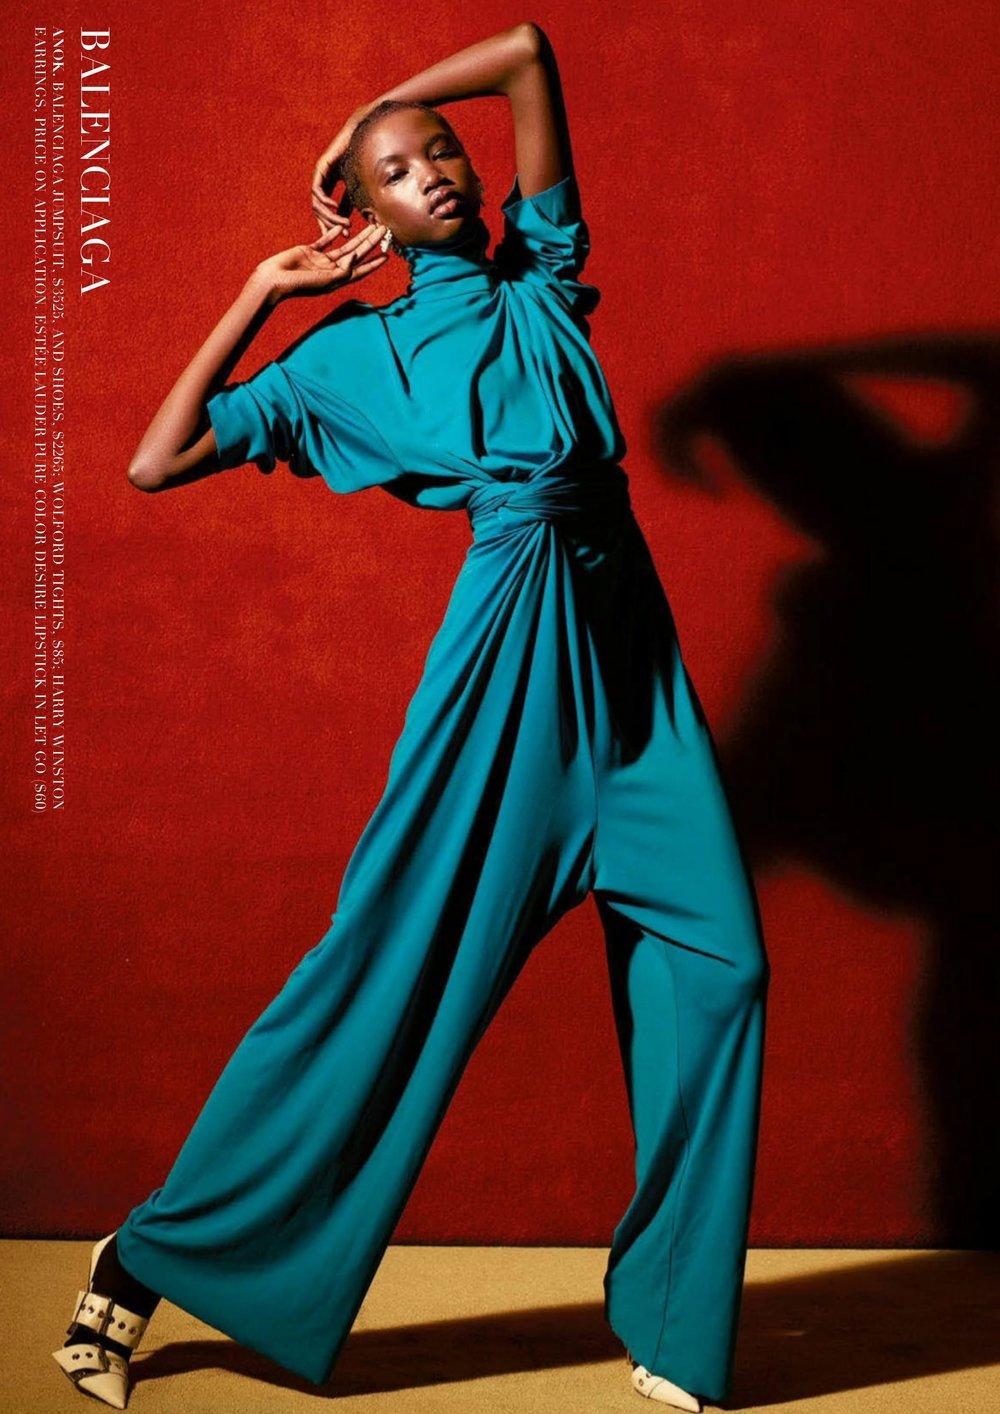 Mario Sorrenti for Harper's Bazaar Australia March 2019 (3).jpg